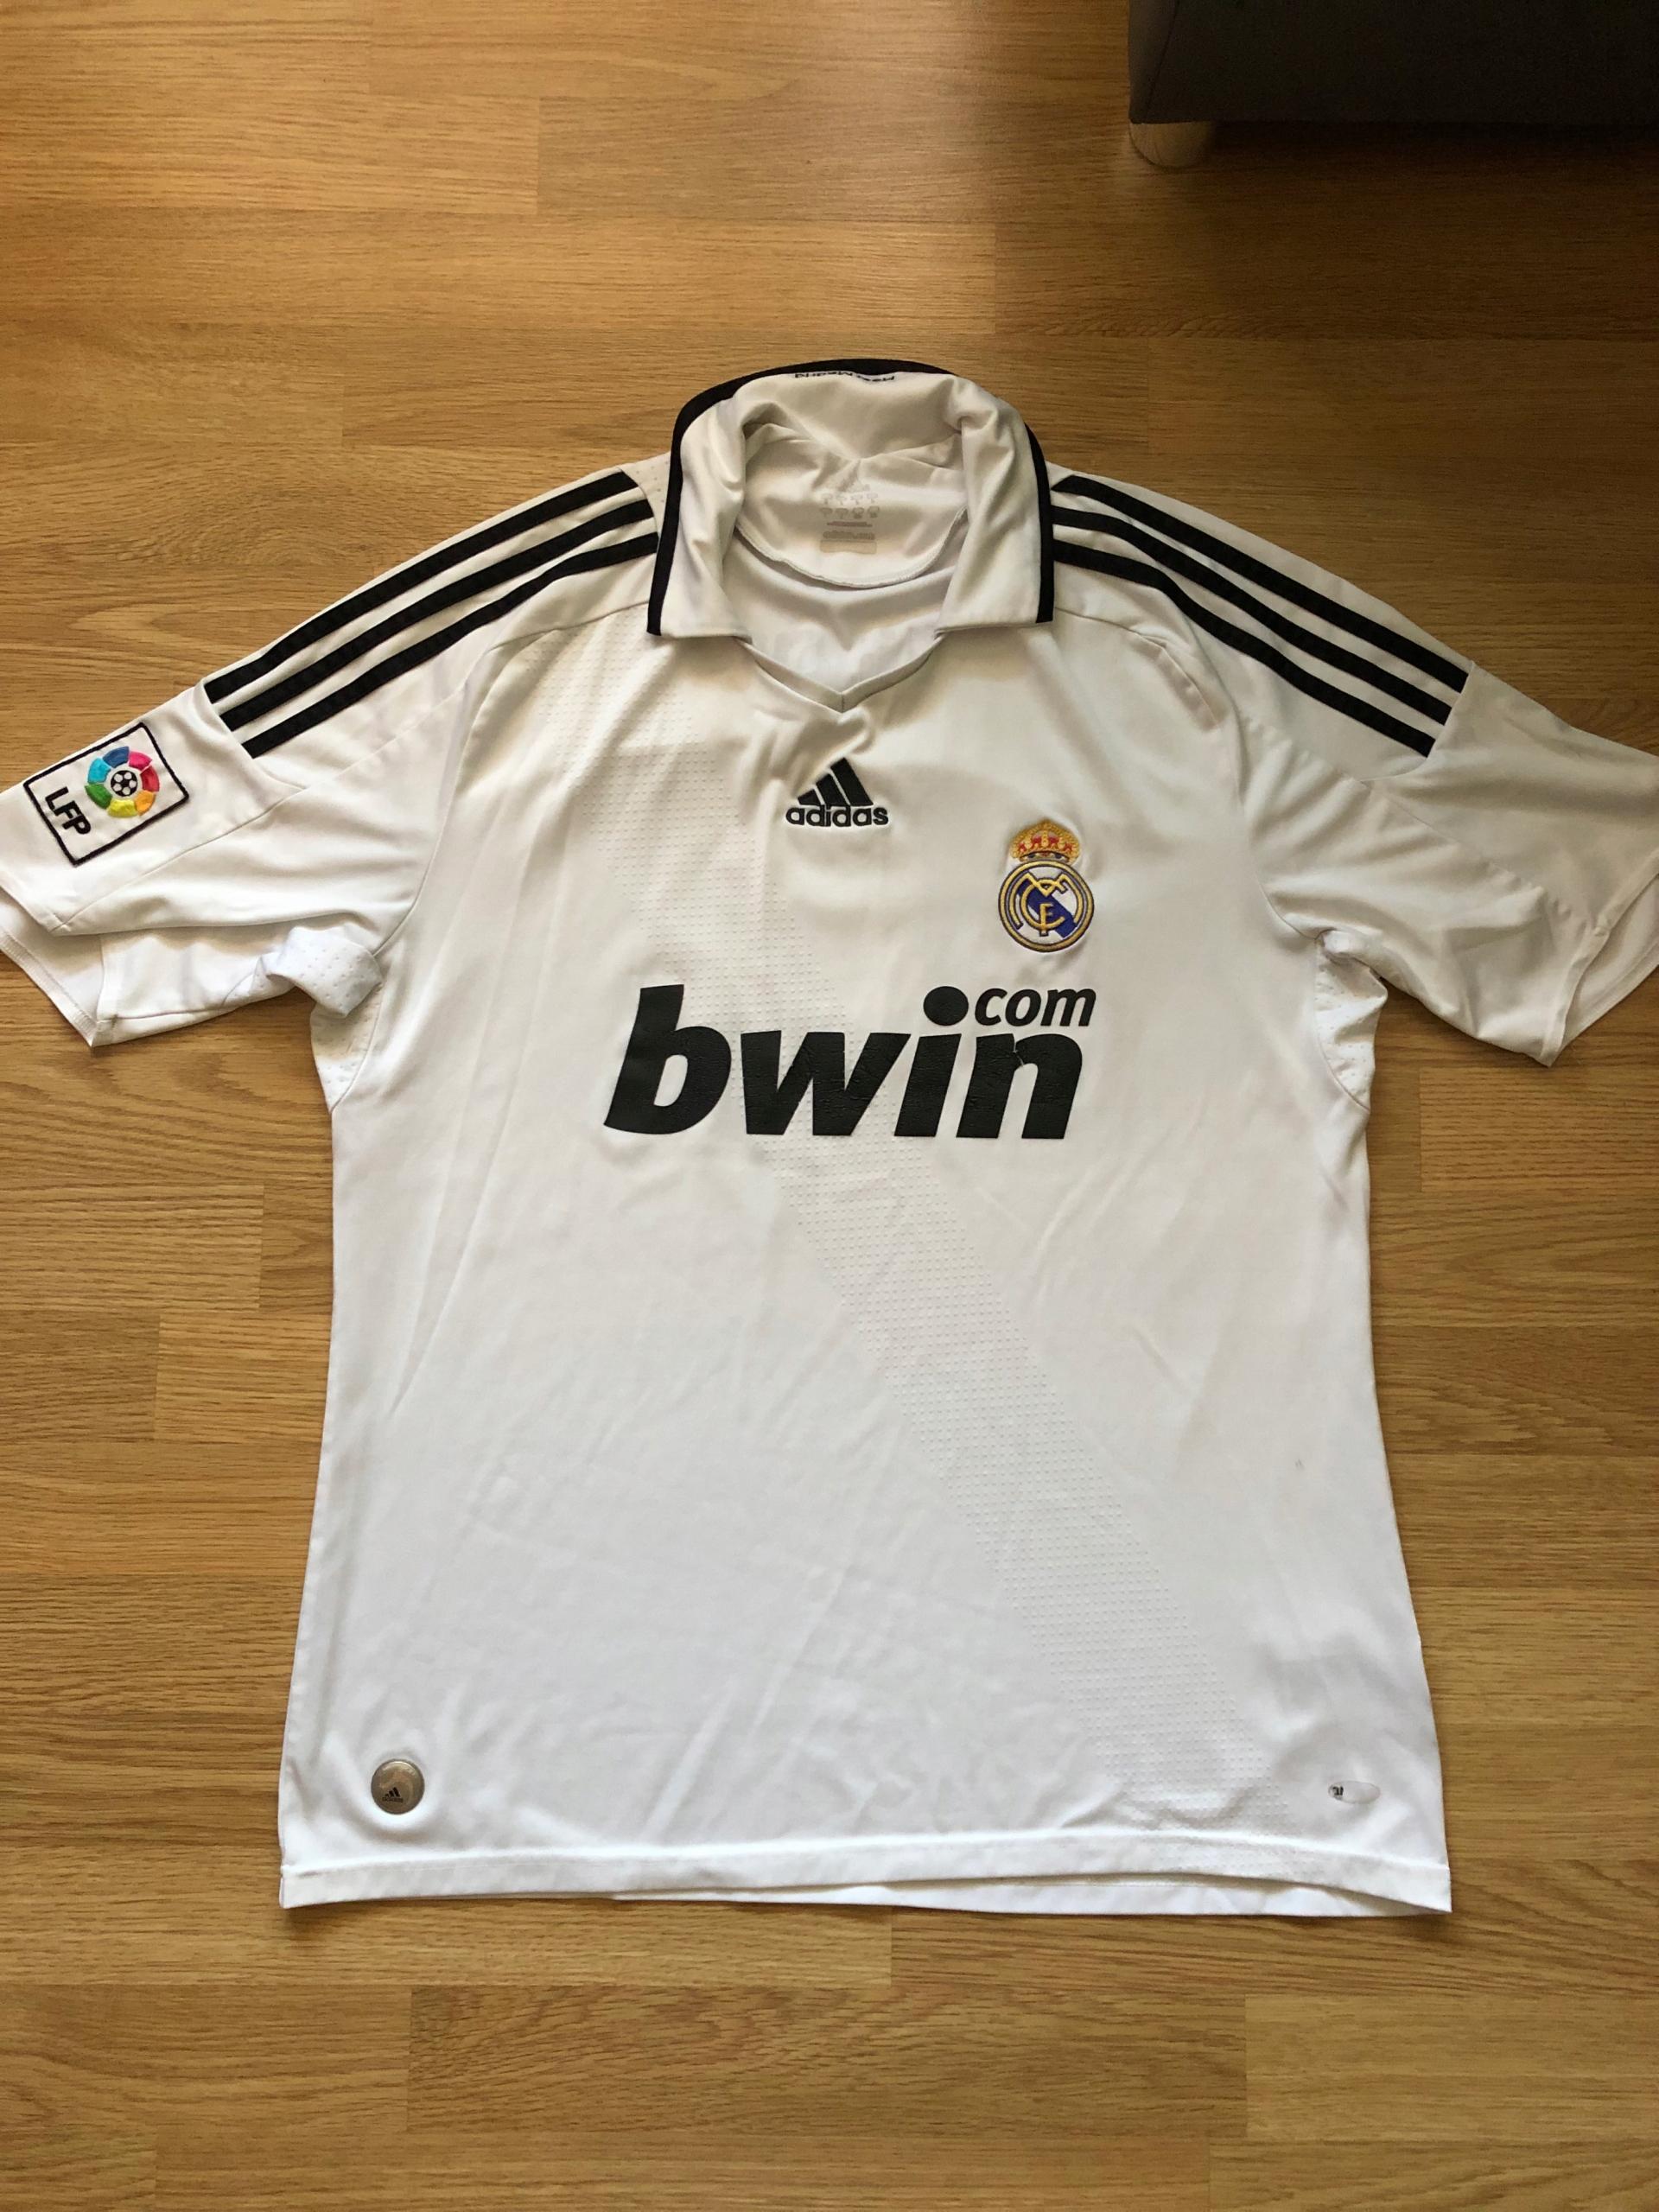 Koszulka Real Madryt, Sergio Ramos, Adidas, L